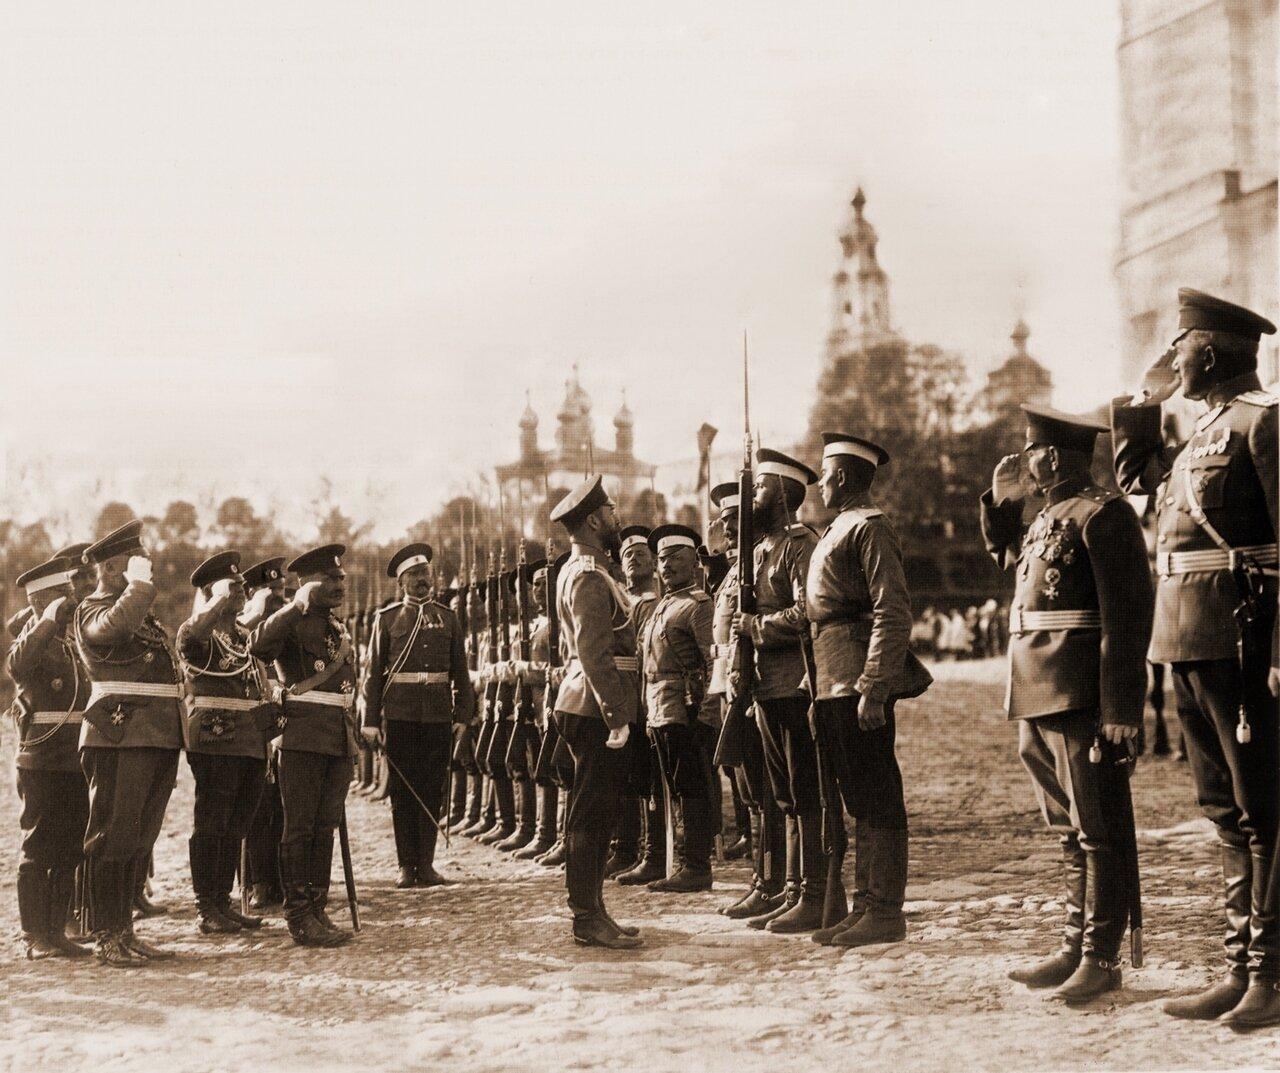 Николай II принимает караул от 183 пехотного Пултусского полка